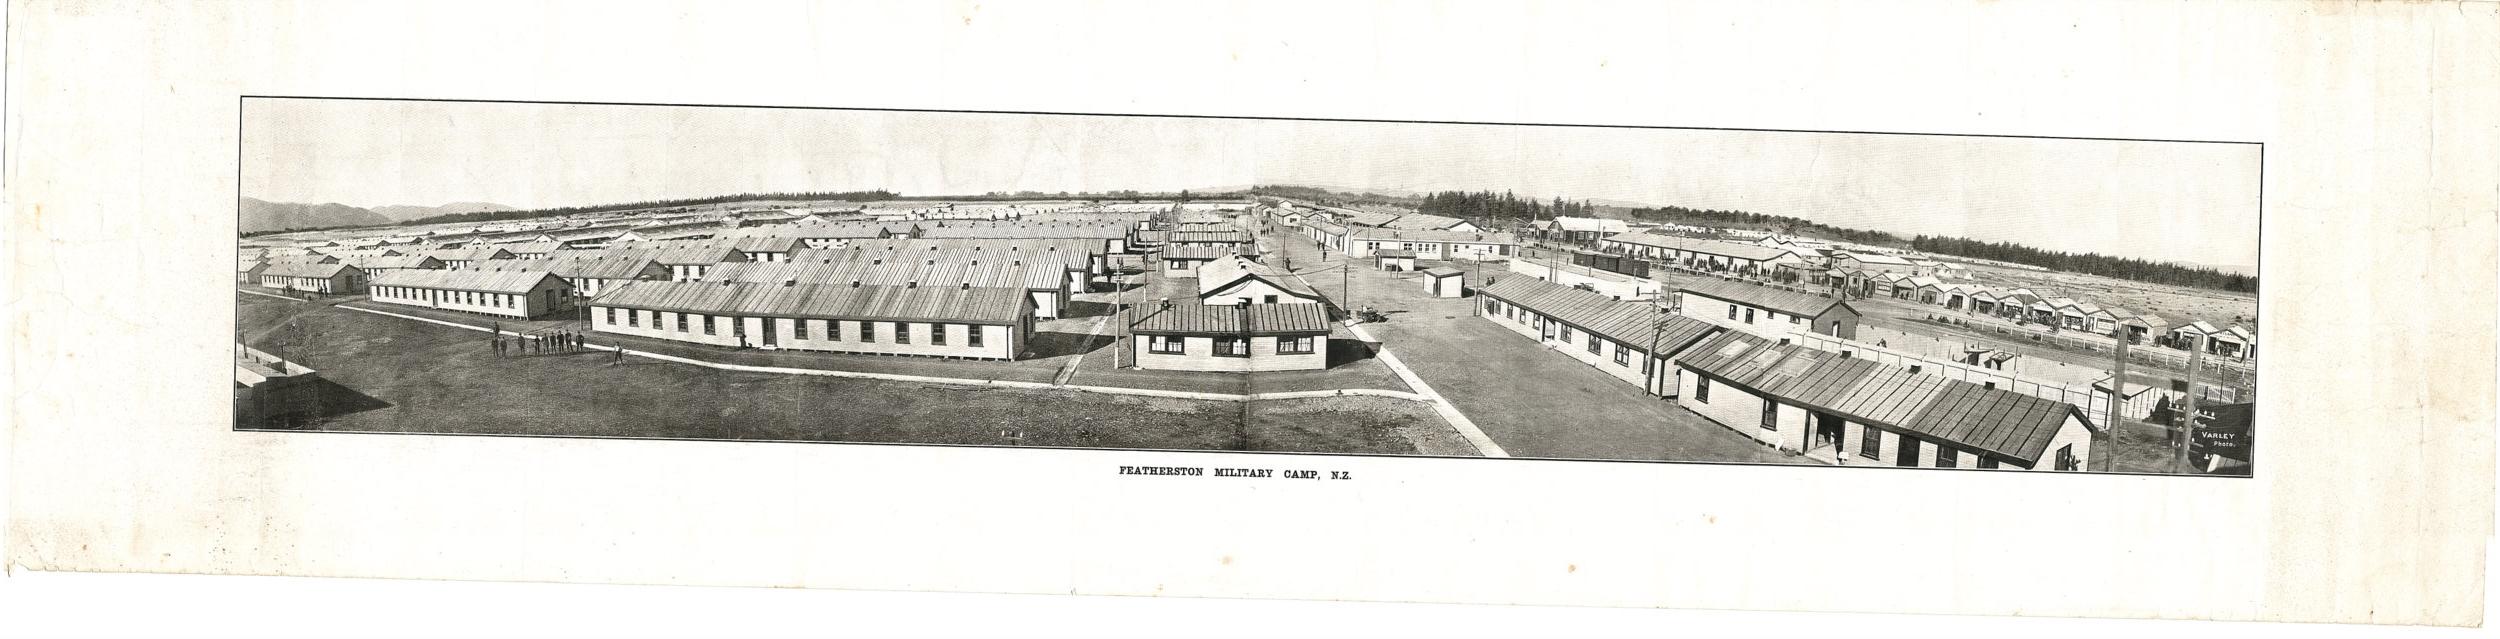 Featherston Military Camp Panorama, c 1914-1918.